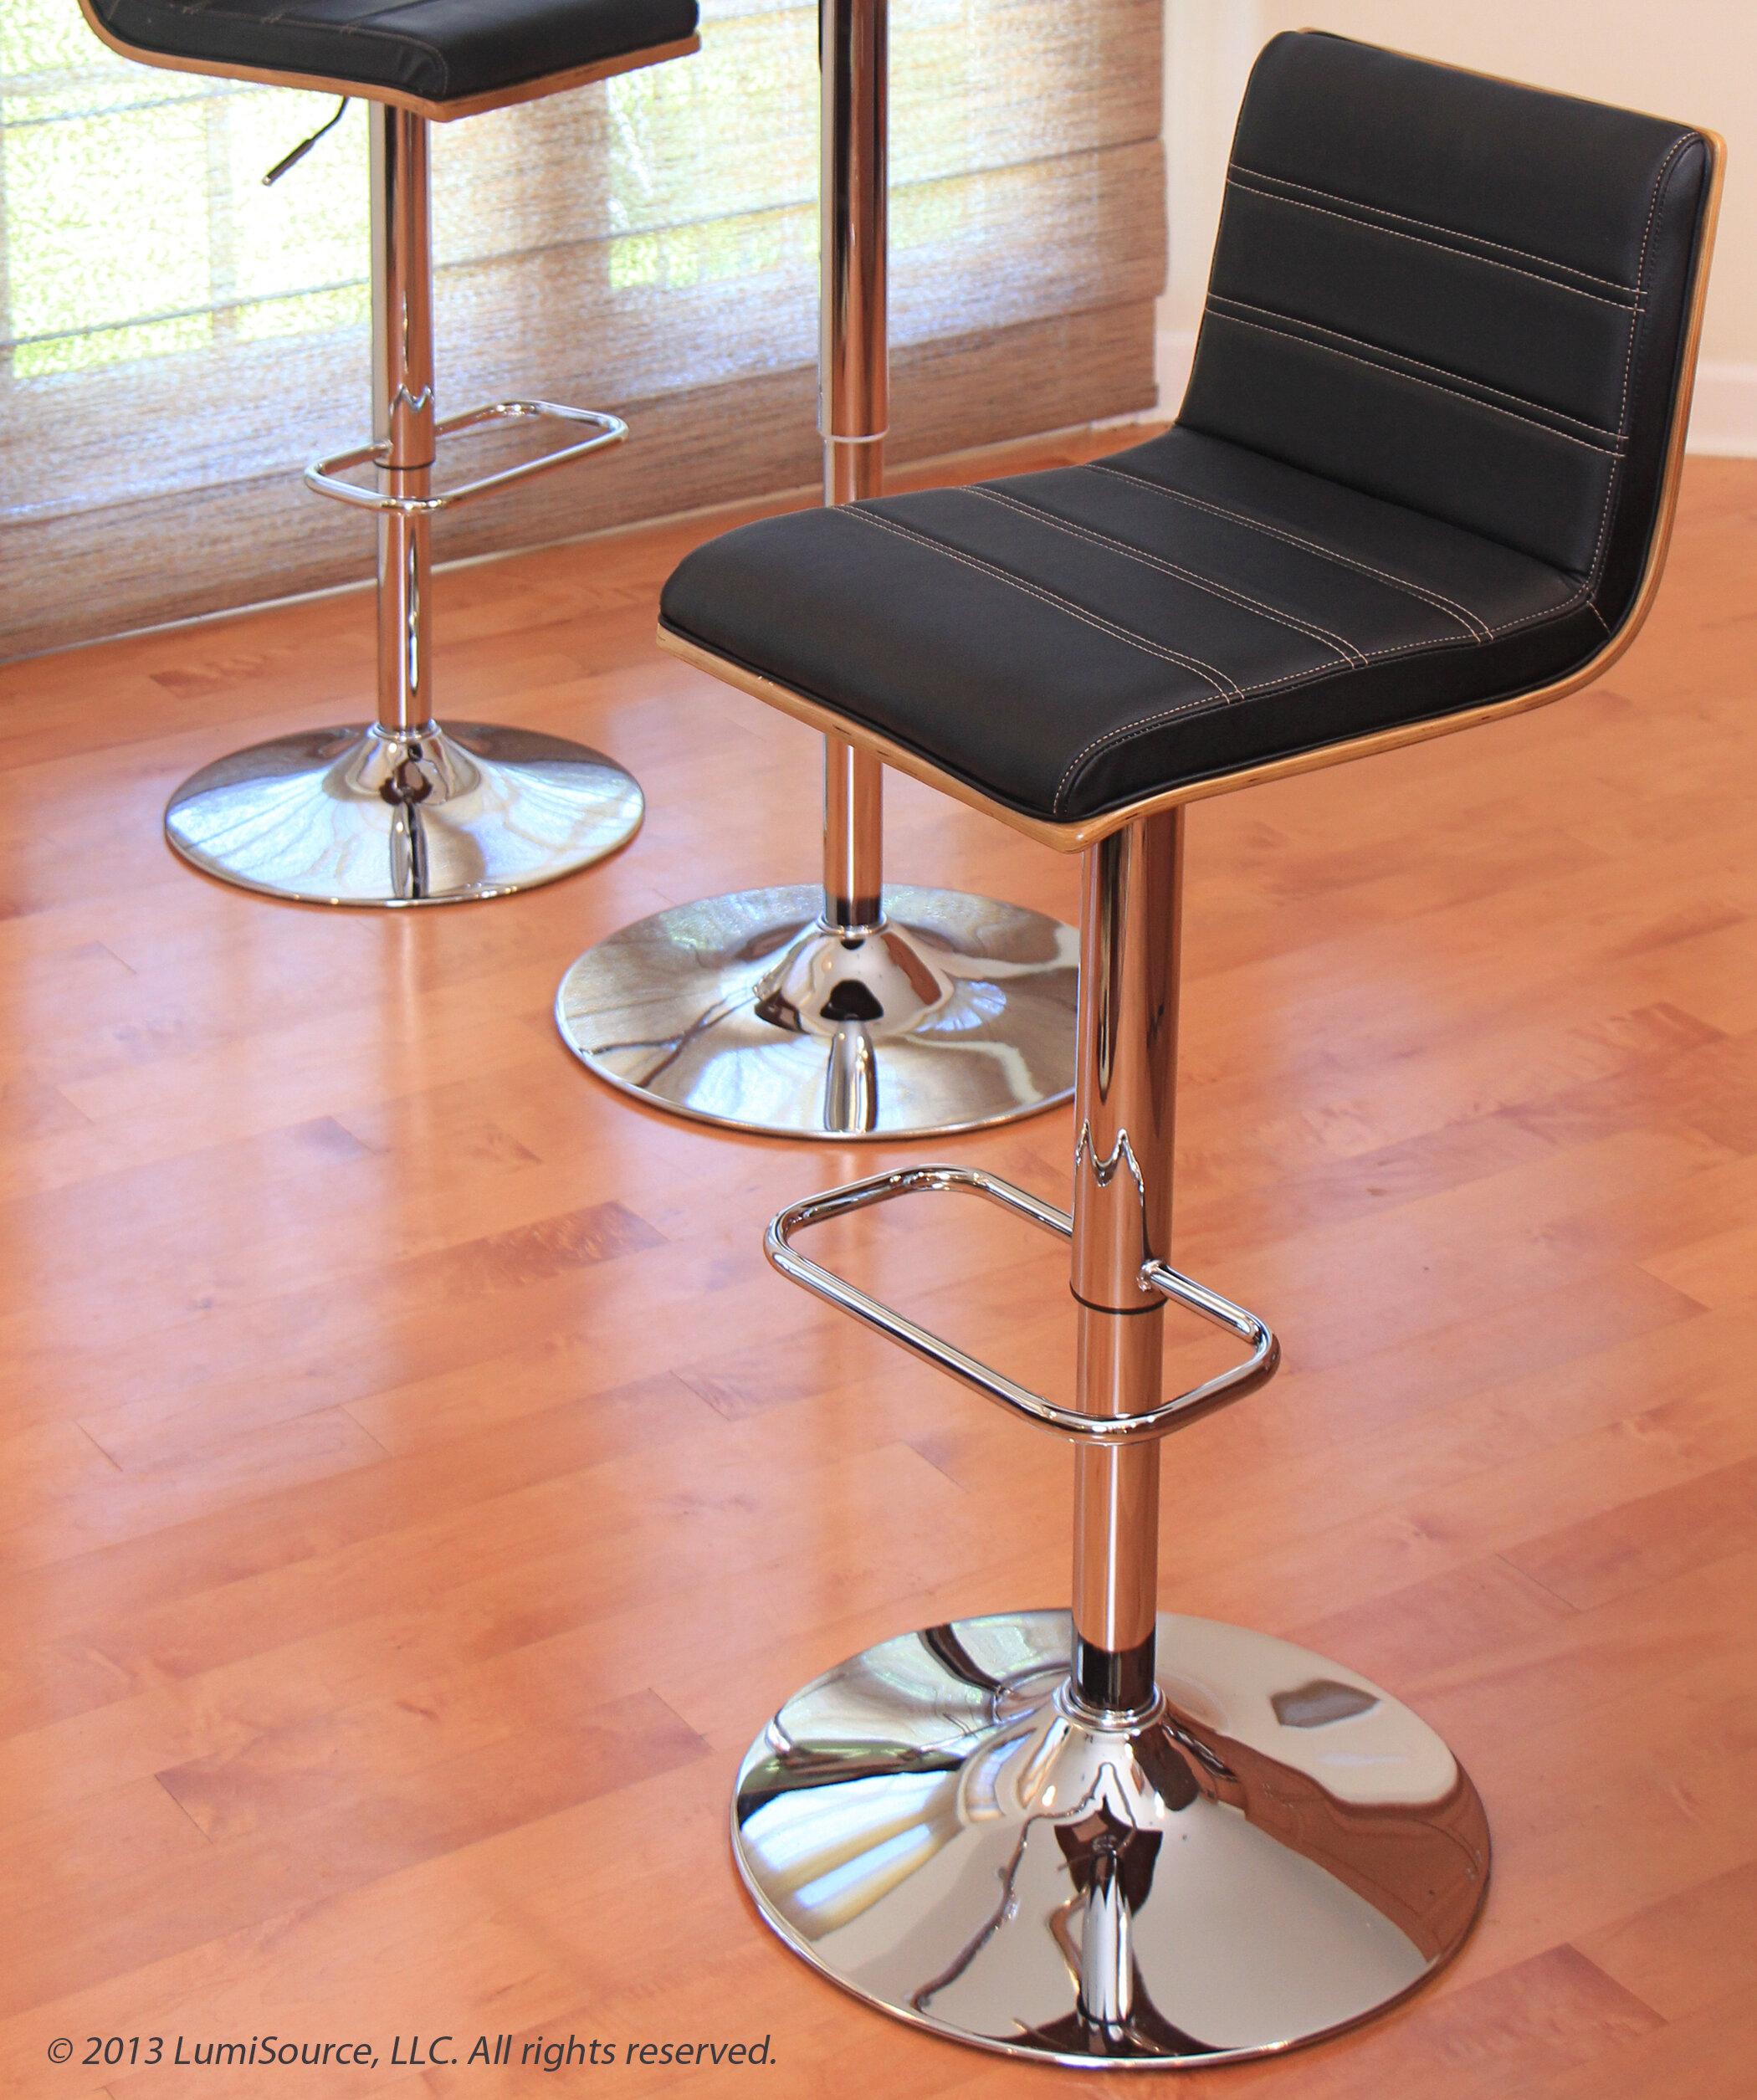 Phenomenal Vasari Adjustable Height Swivel Bar Stool Creativecarmelina Interior Chair Design Creativecarmelinacom